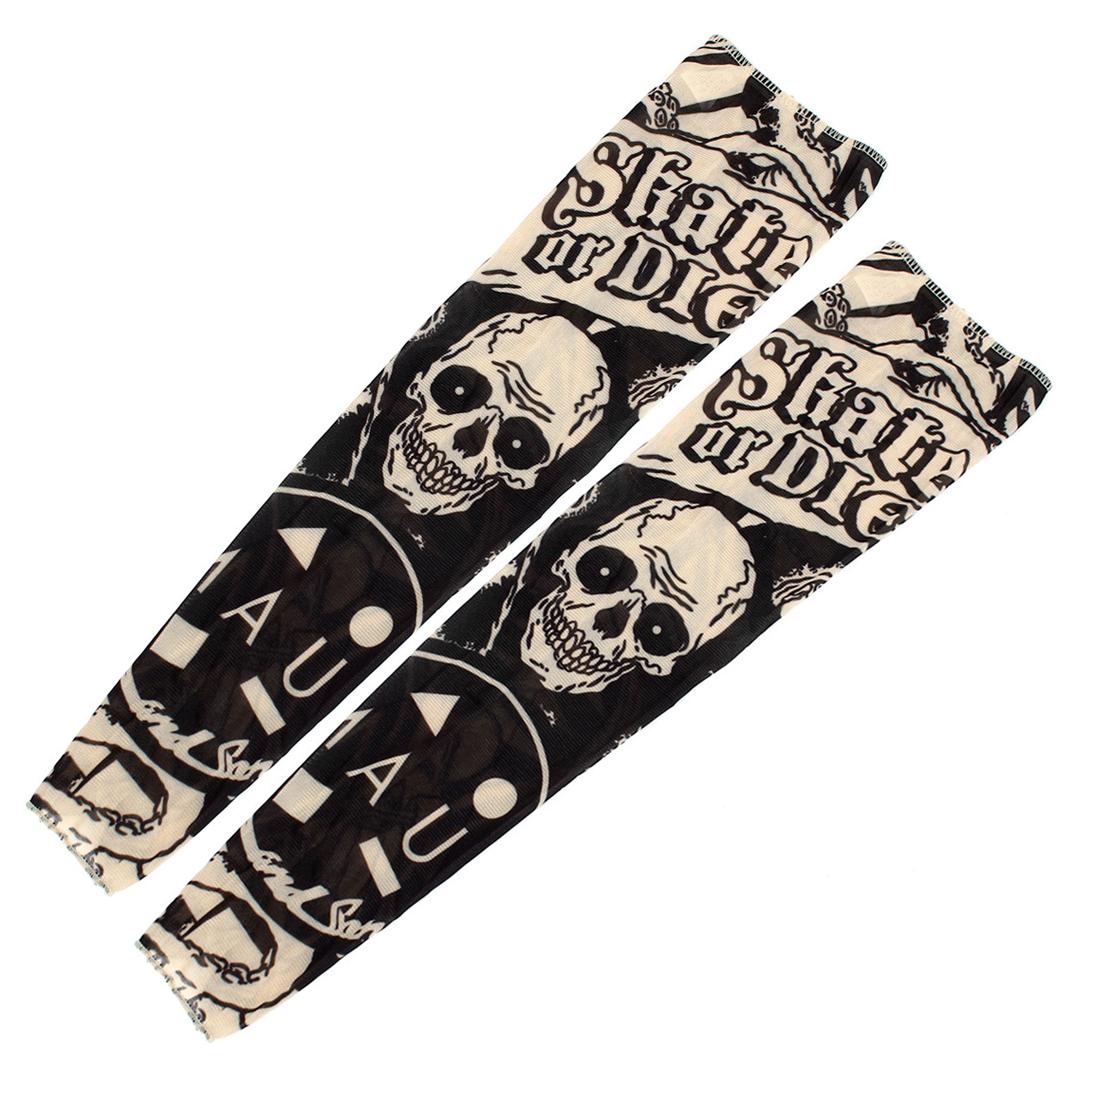 2 Pcs Skull Pattern Stretchy Christmas Stocking Fake Tattoo Arm Sleeve - image 1 de 1